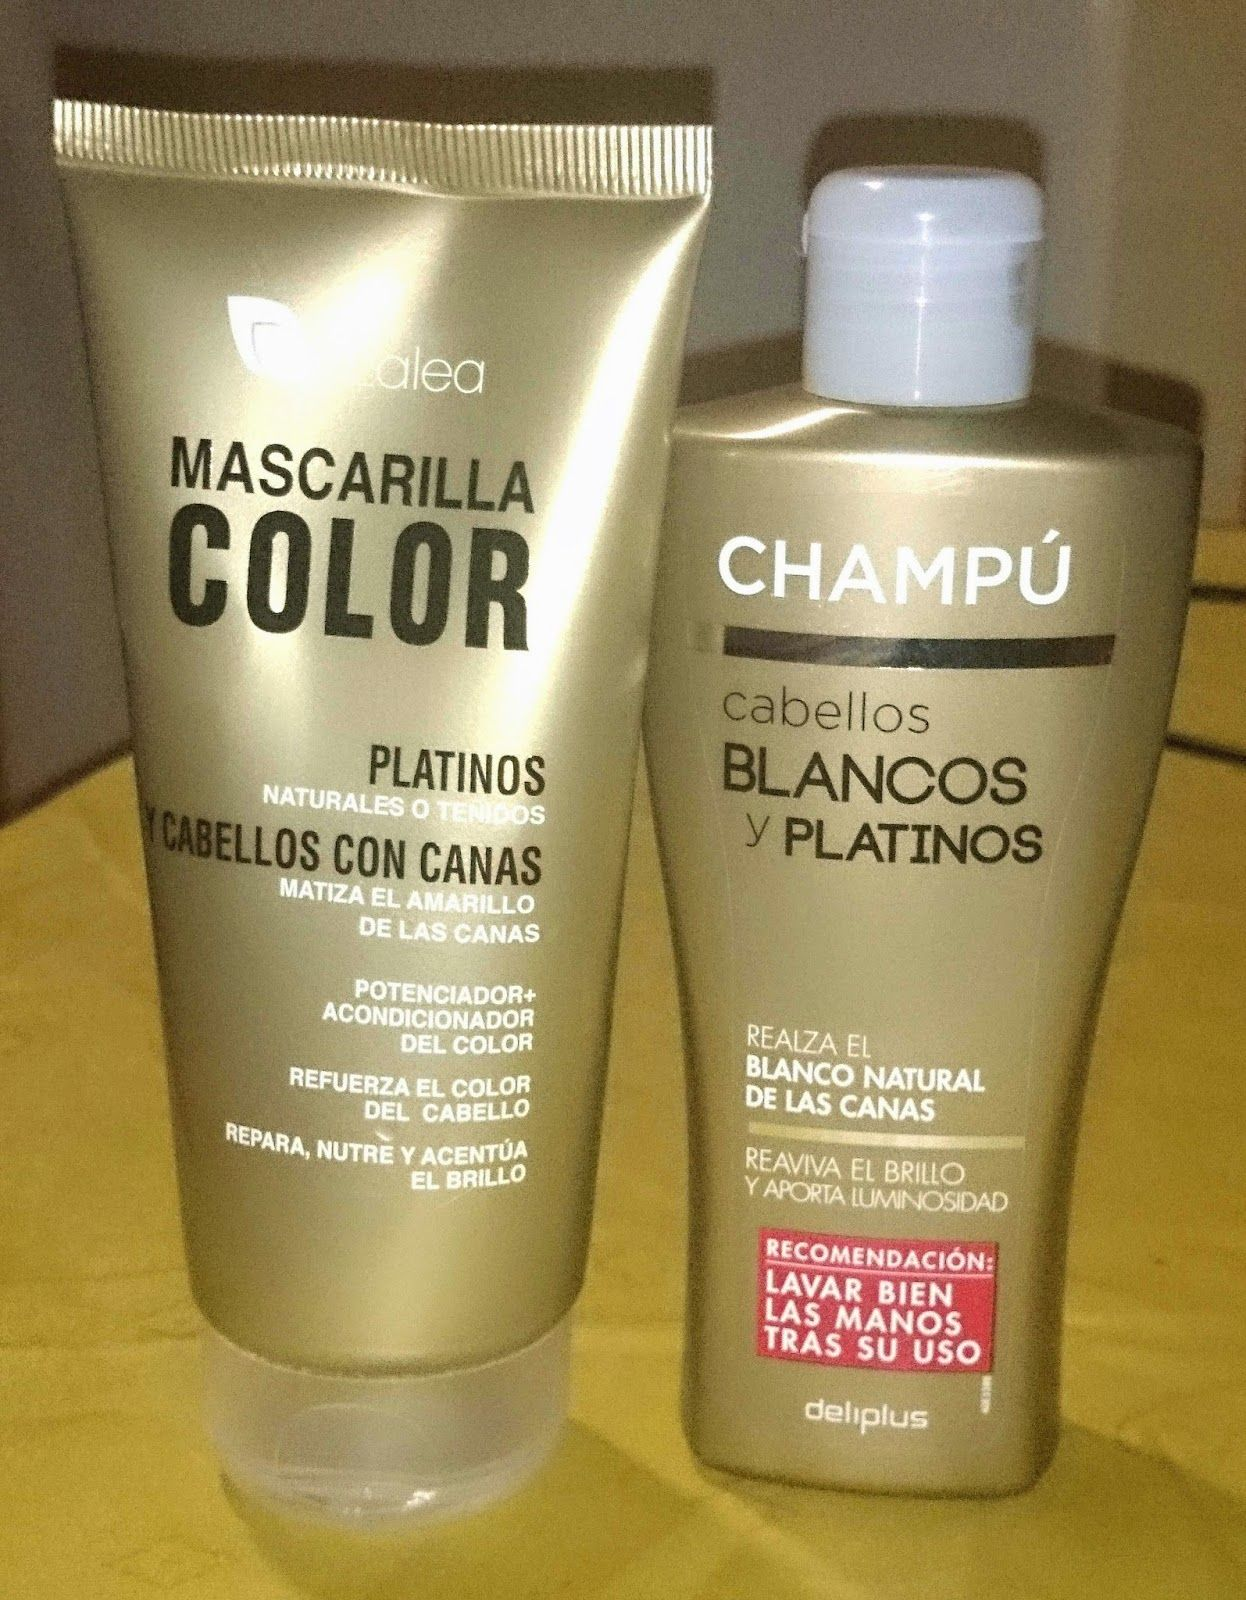 Shampoo Matizador Para Cabellos Platinos Diciembre 2017 Matizador De Cabello Cabello Rubio Claro Cabello Rubio